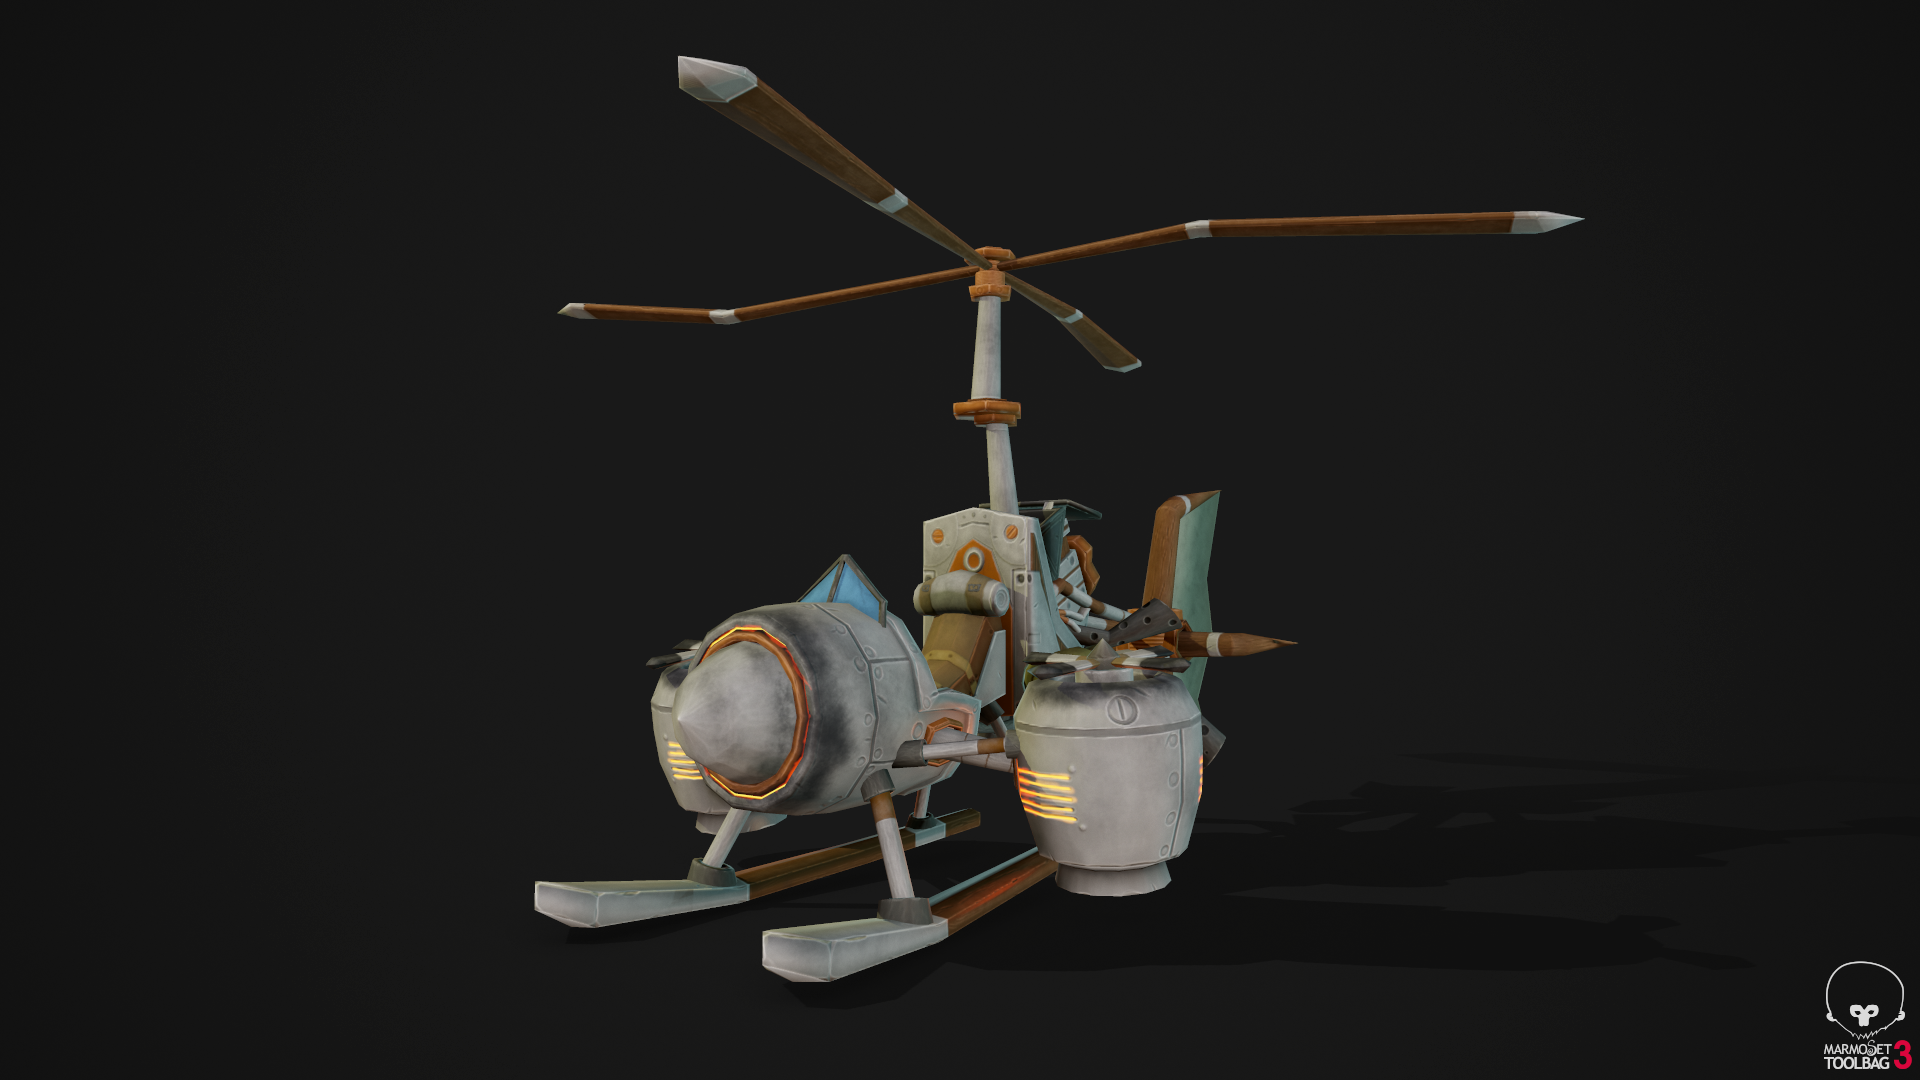 Stylized gyrocopter